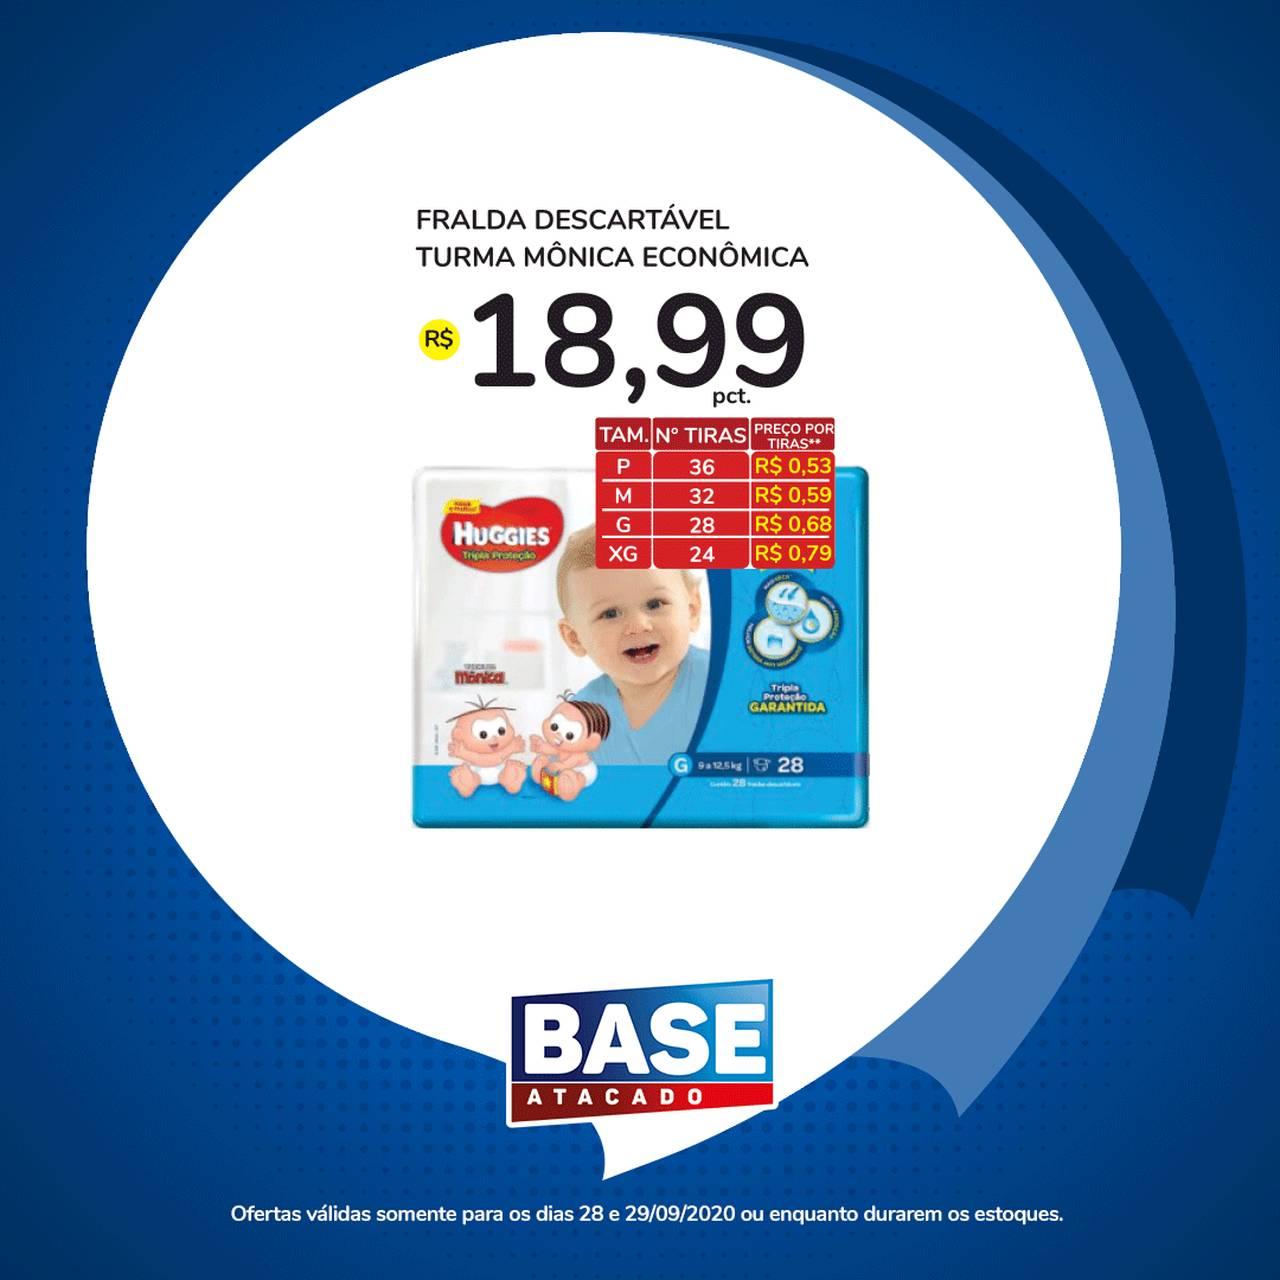 Ofertas de supermercado BASE atacado segunda e terça de super ofertas vence 29-09-3